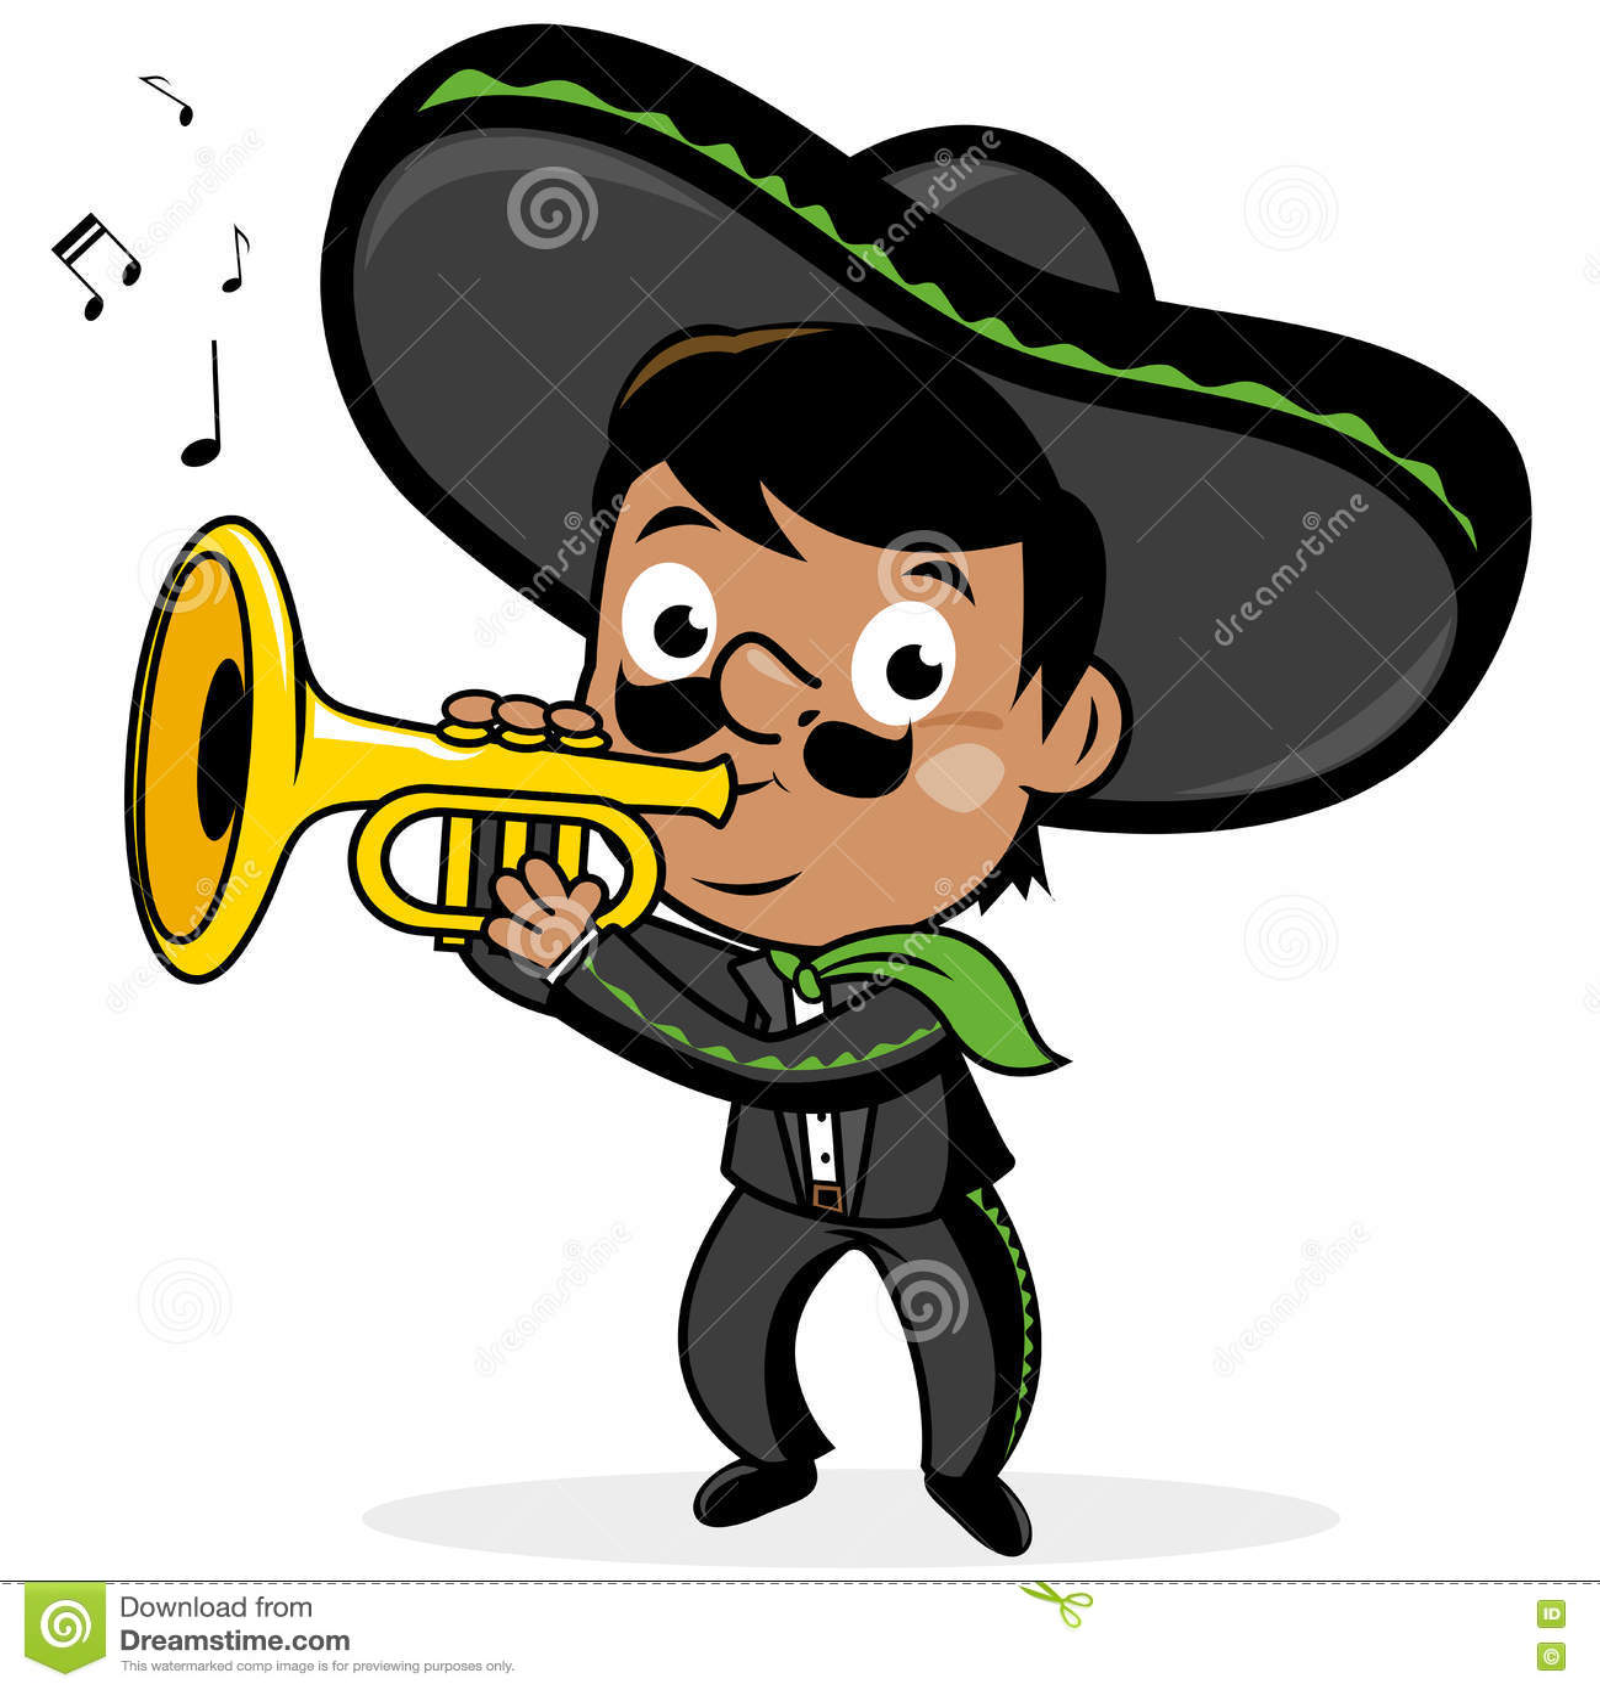 Mariachi Musician Cartoons, Illustrations & Vector Stock Images - 78 ...